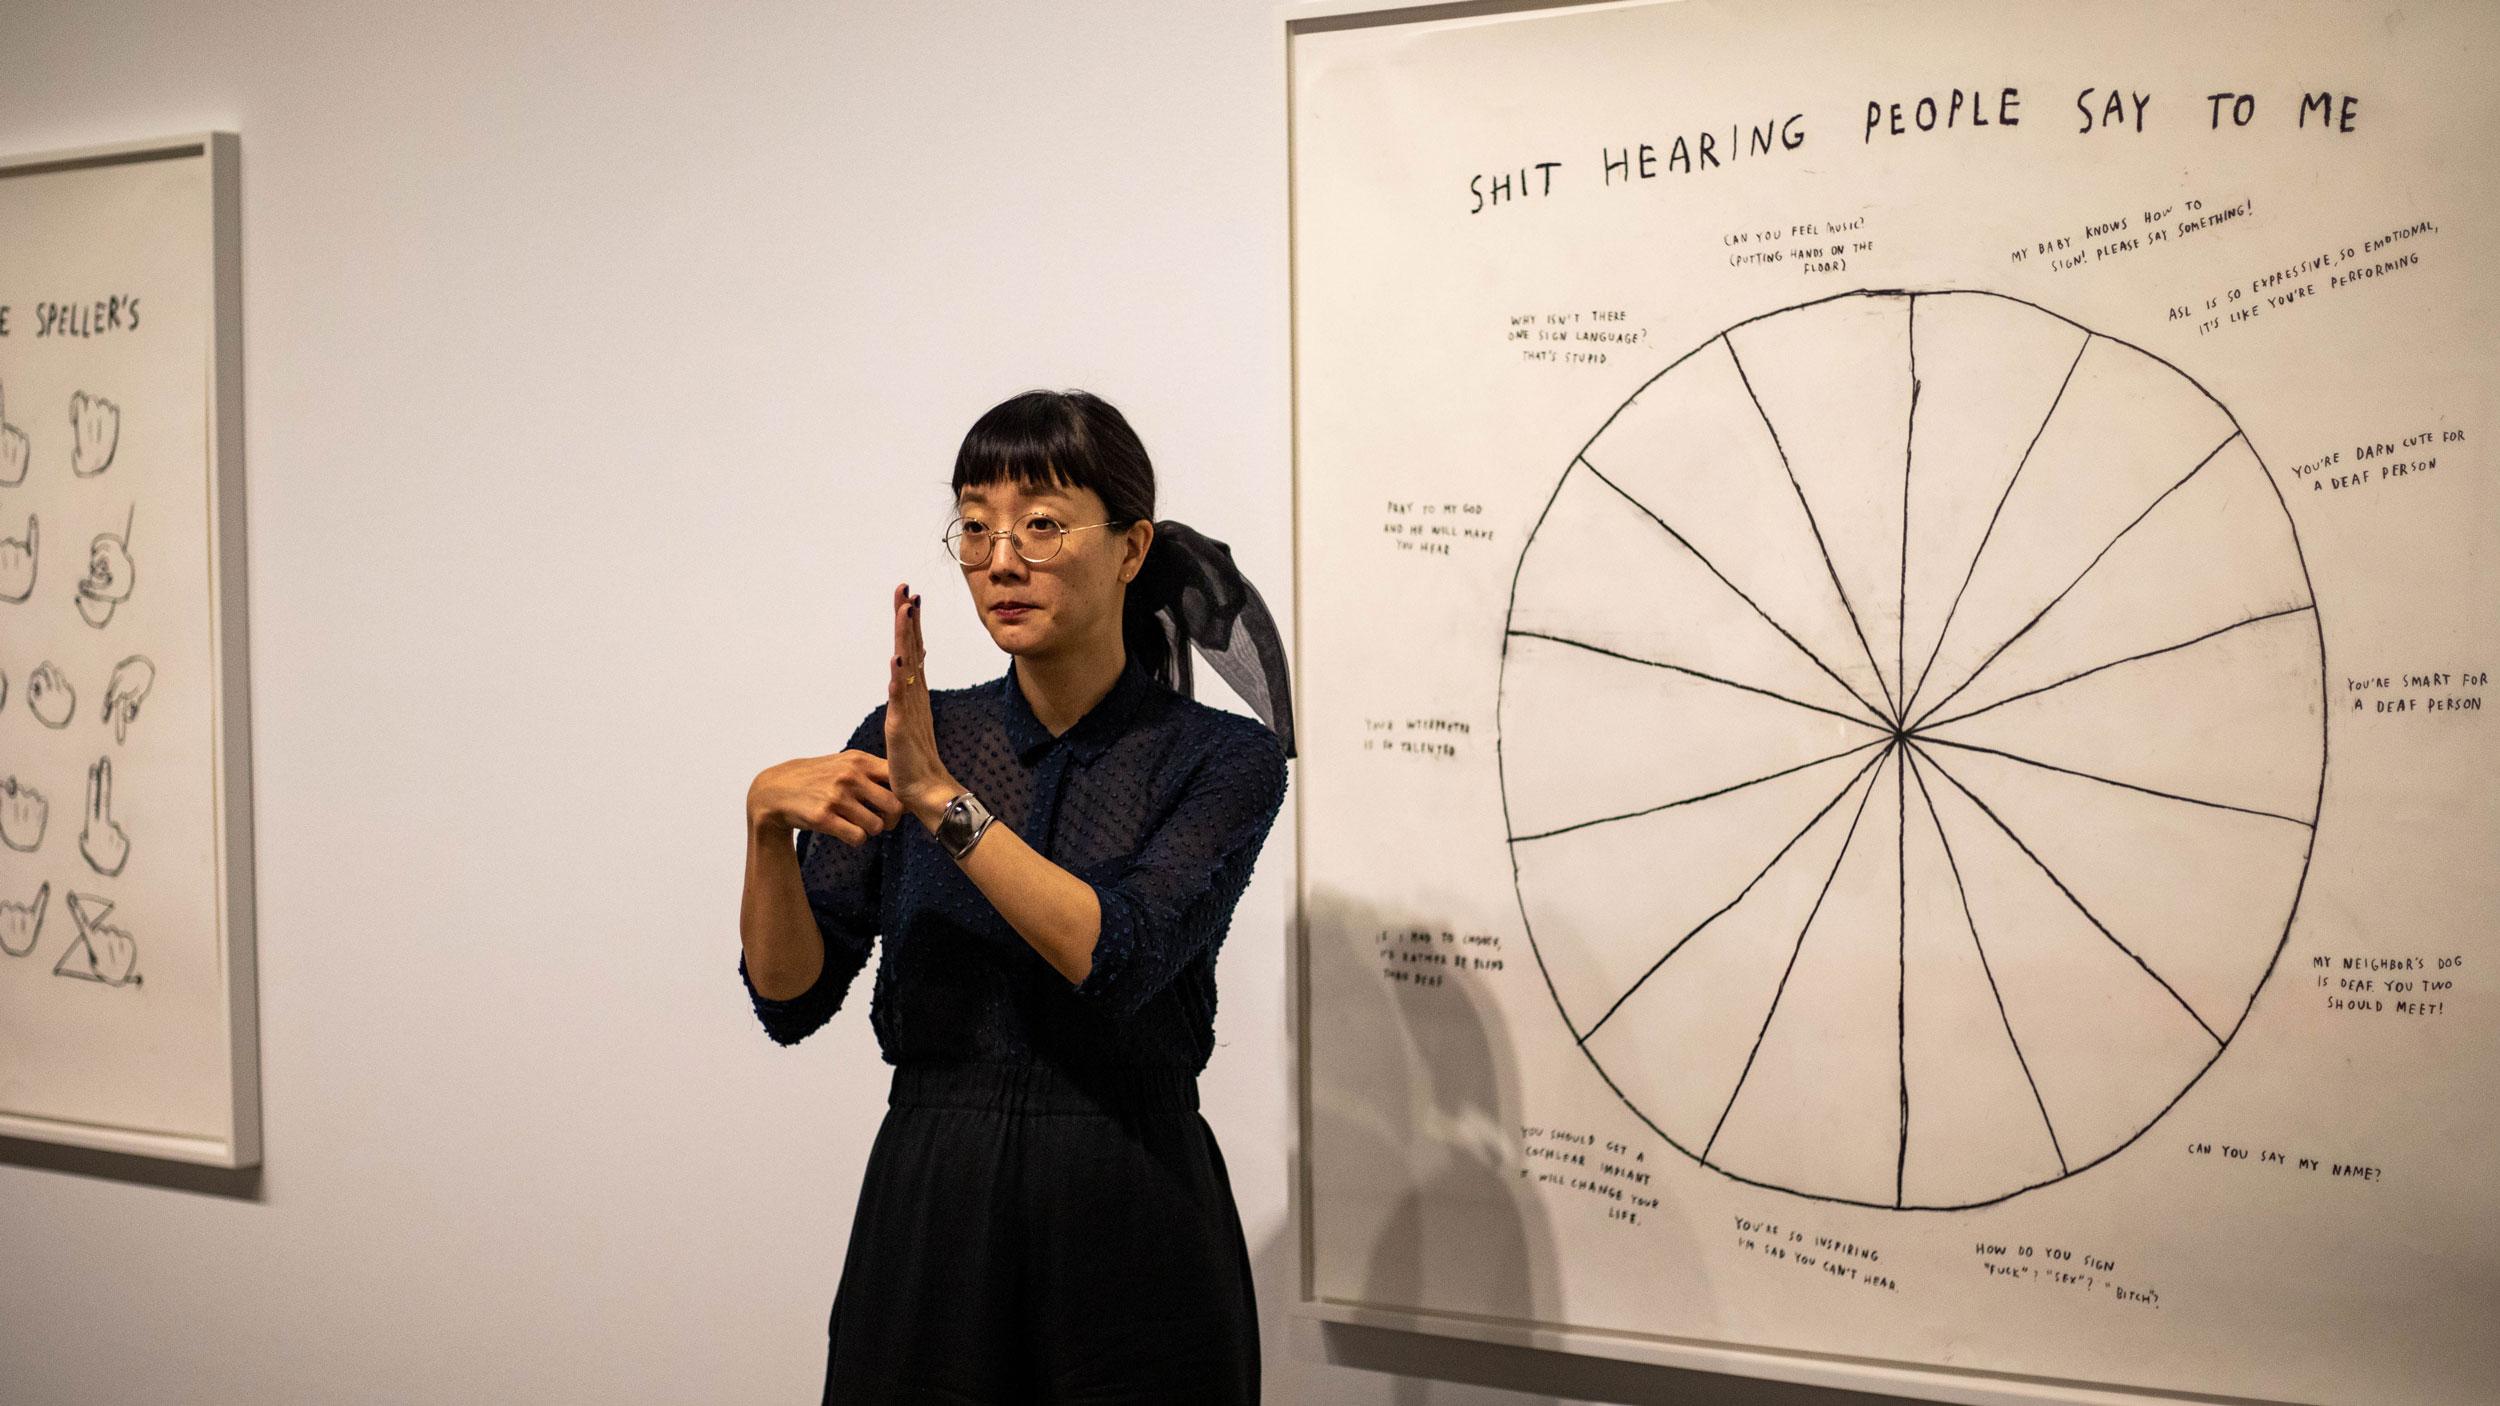 Artist Christine Sun Kim on 'deaf rage' and the power of soundPRI.org